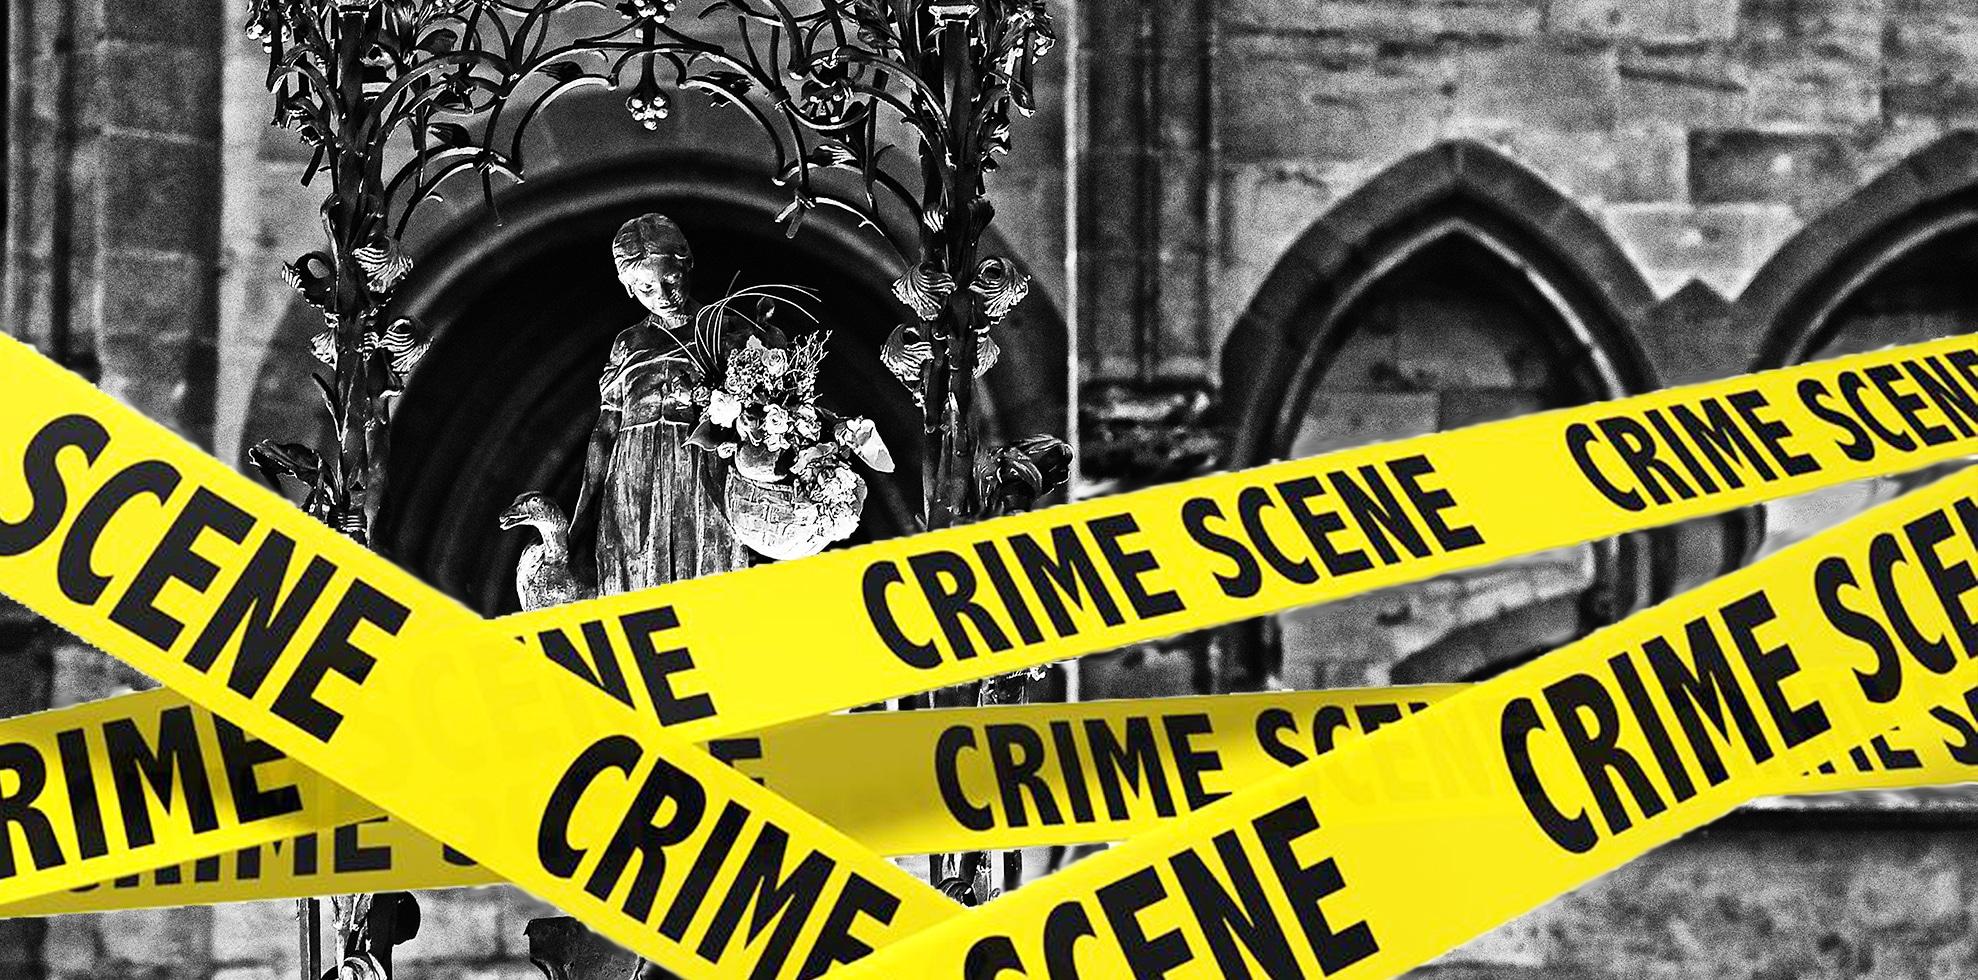 Gänseliesel_CM_sw2_Mag_Crime_heller